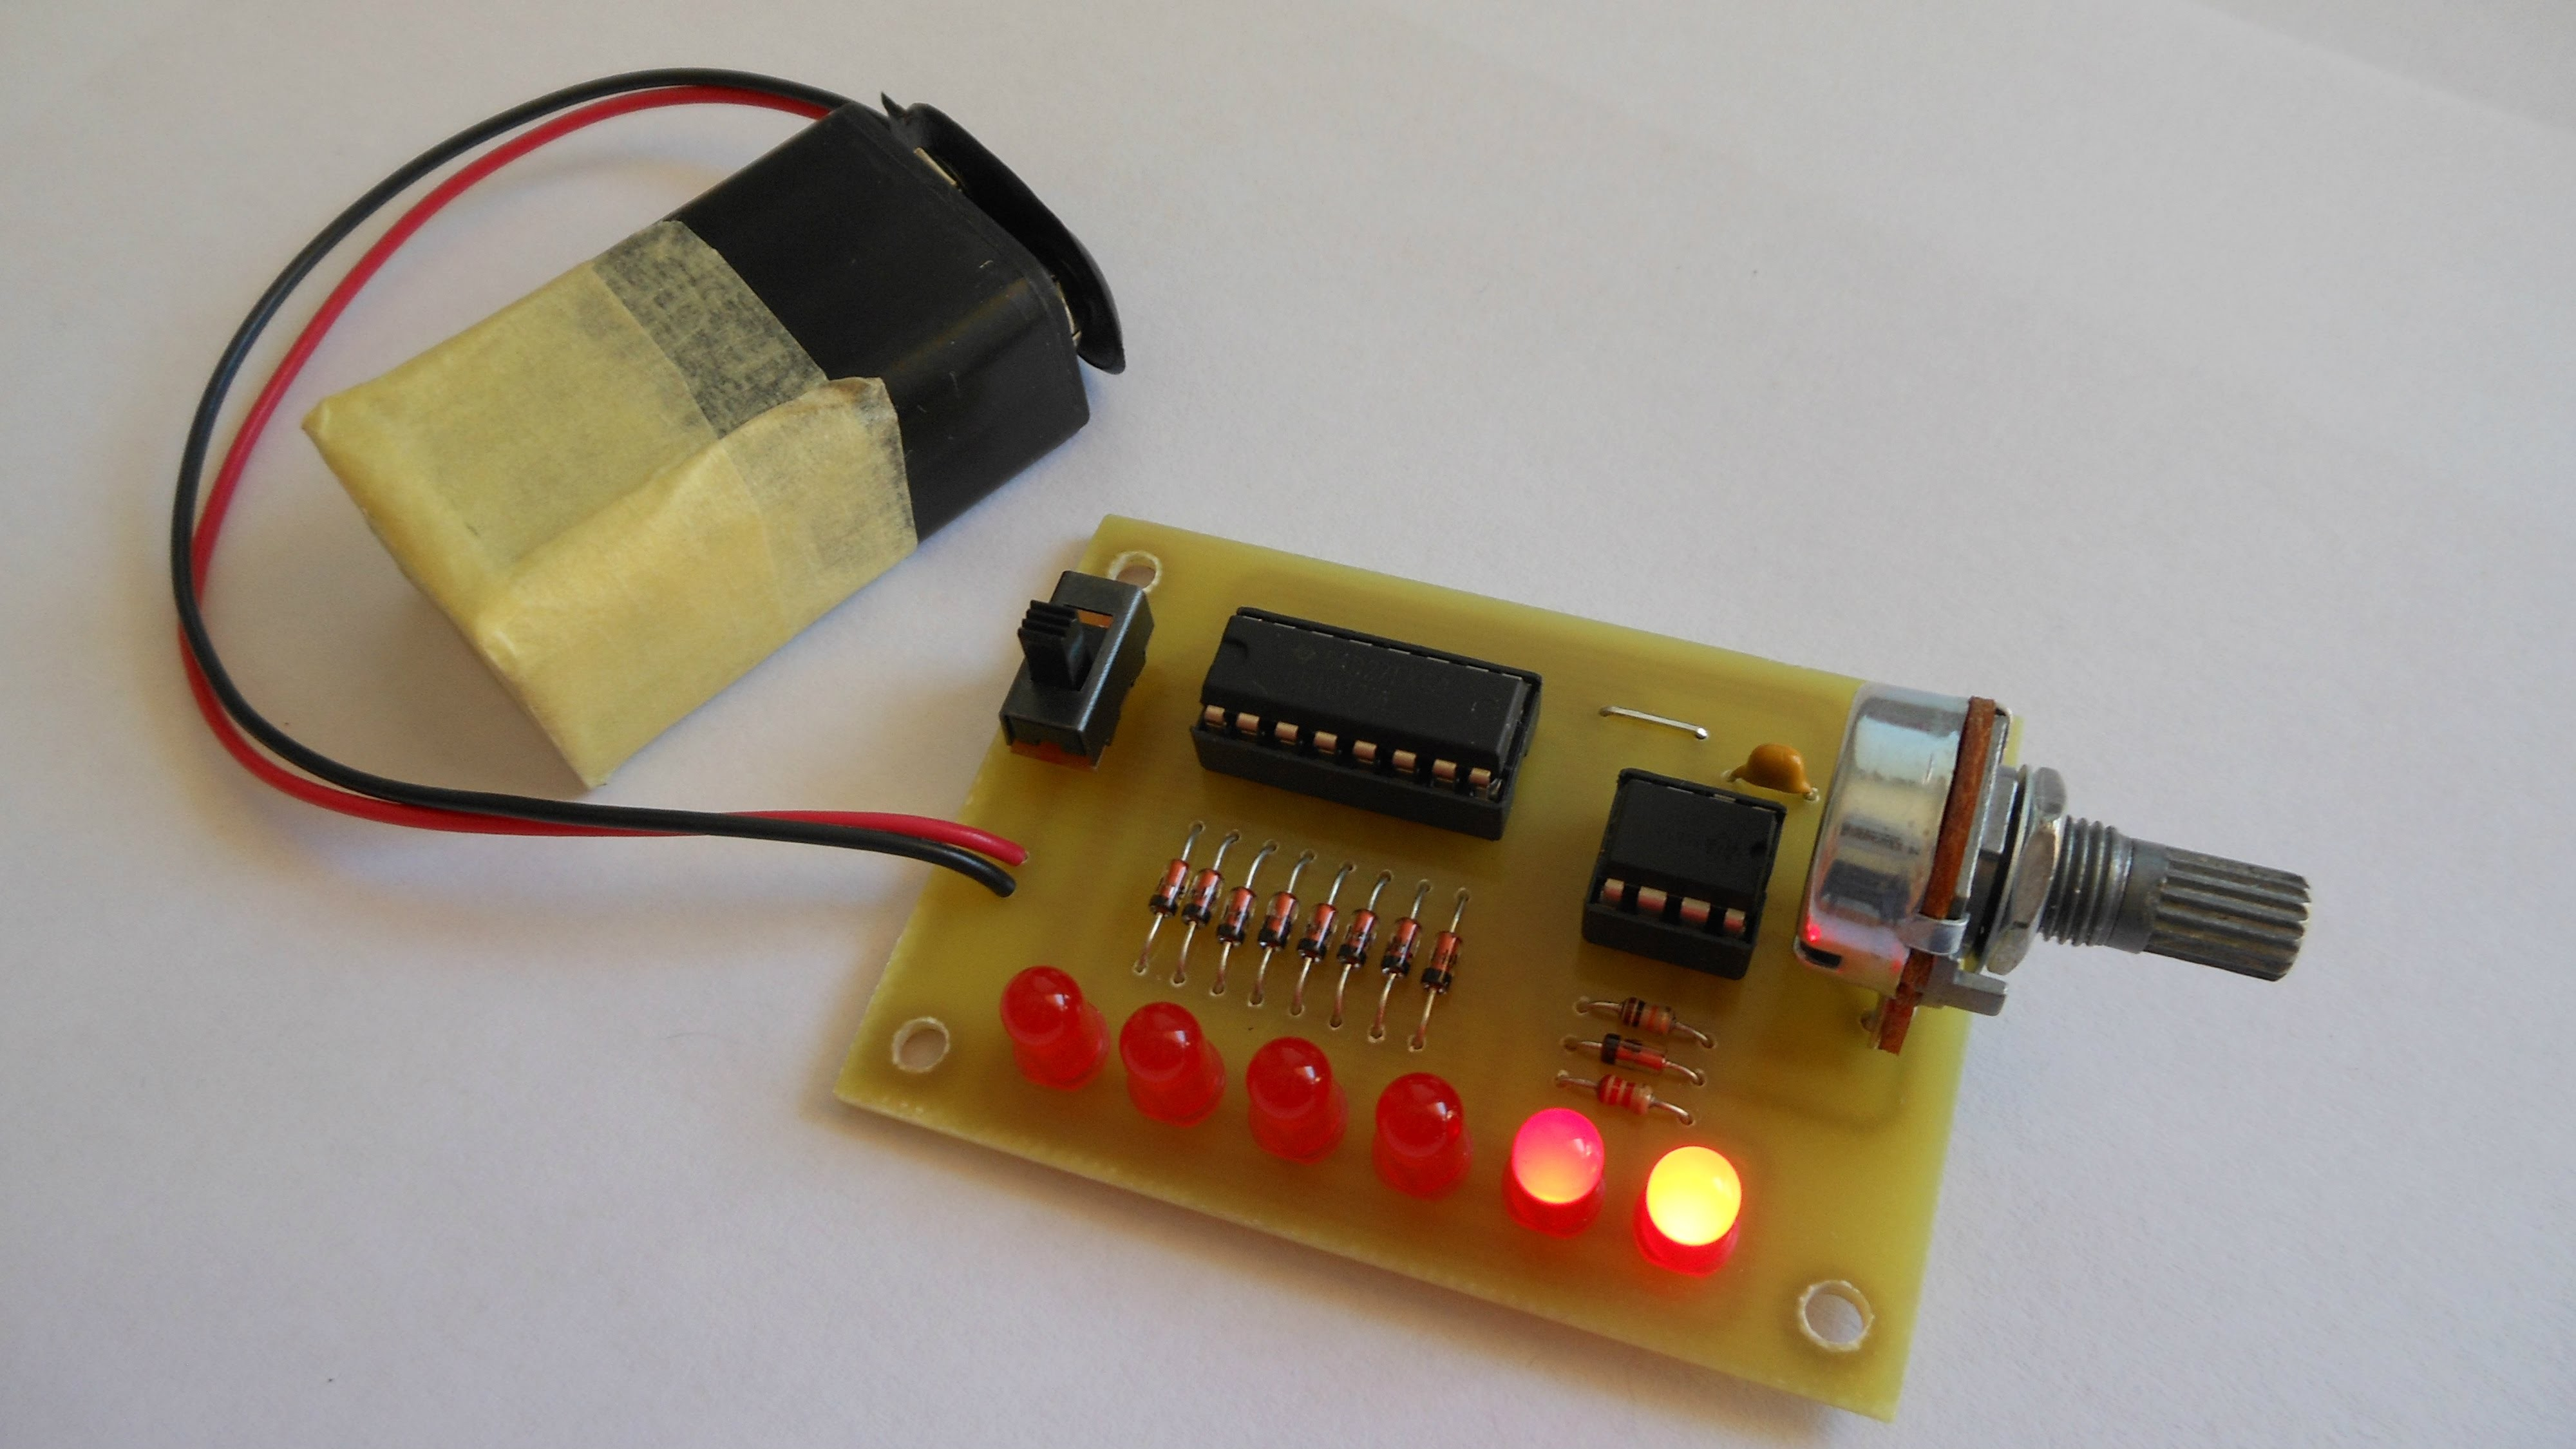 Knight Rider Circuit Awesome Wiring Diagram Image 555 Circuitjpg Led Flasher 4017 Diy Circuits